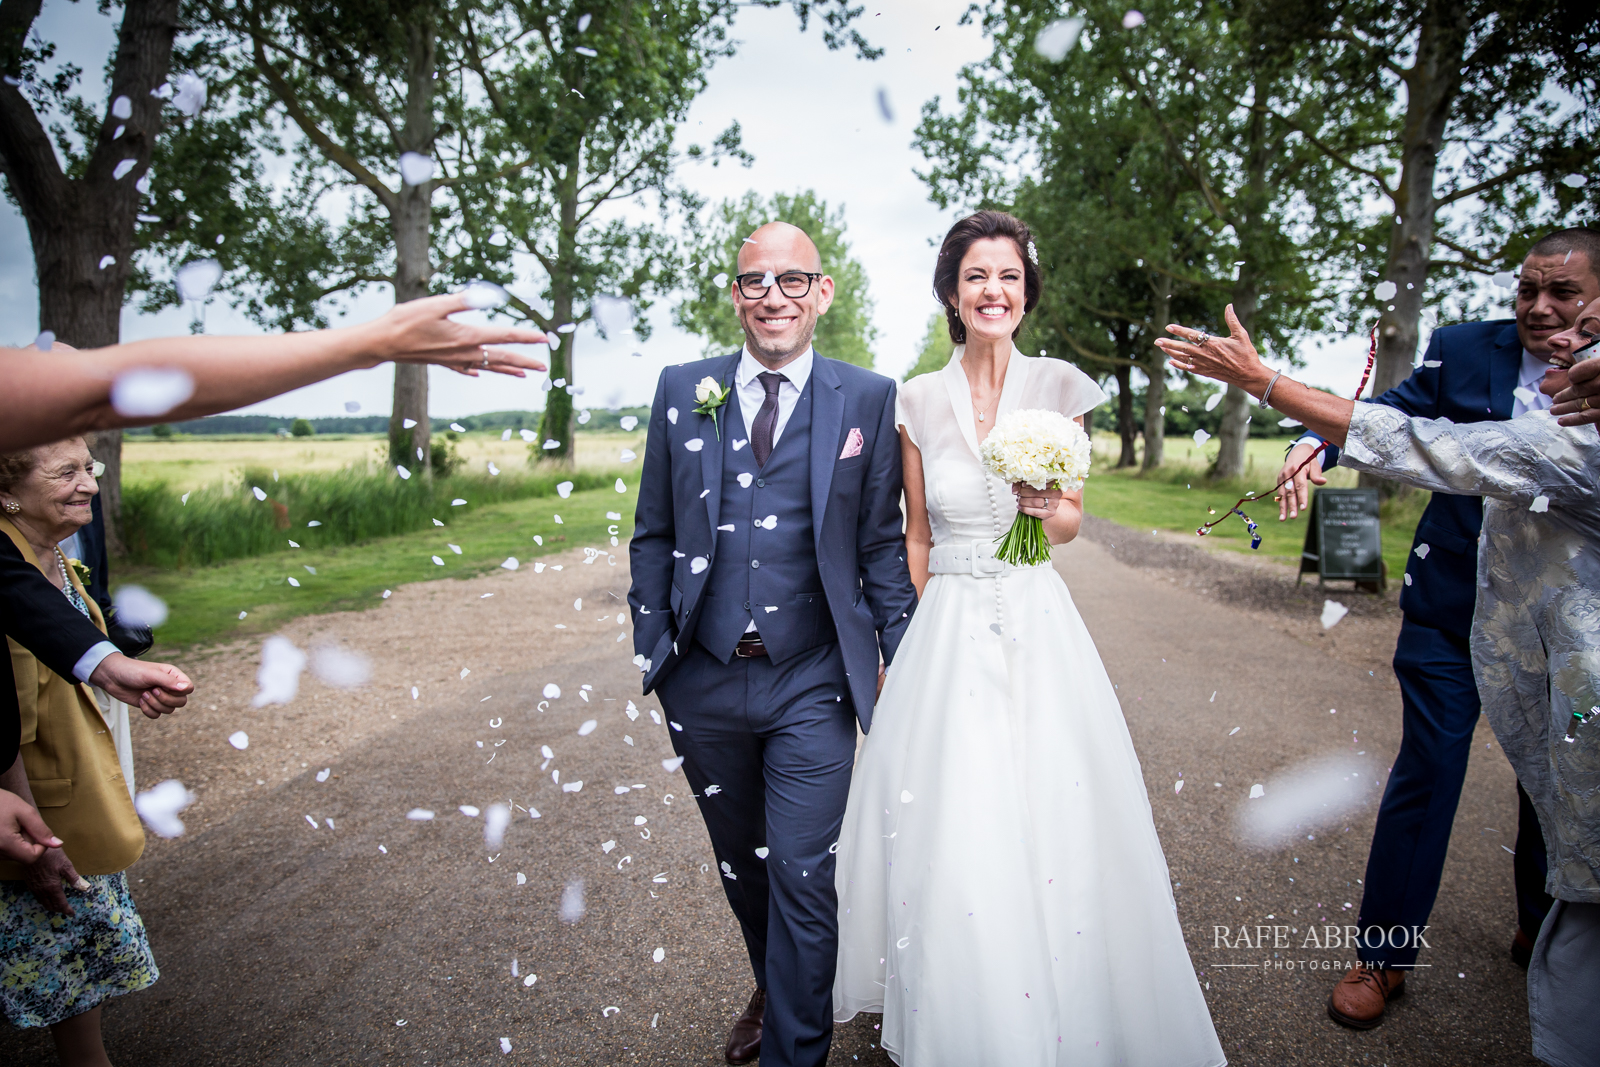 cley windmill wedding norfolk hertfordshire wedding photographer-1255.jpg